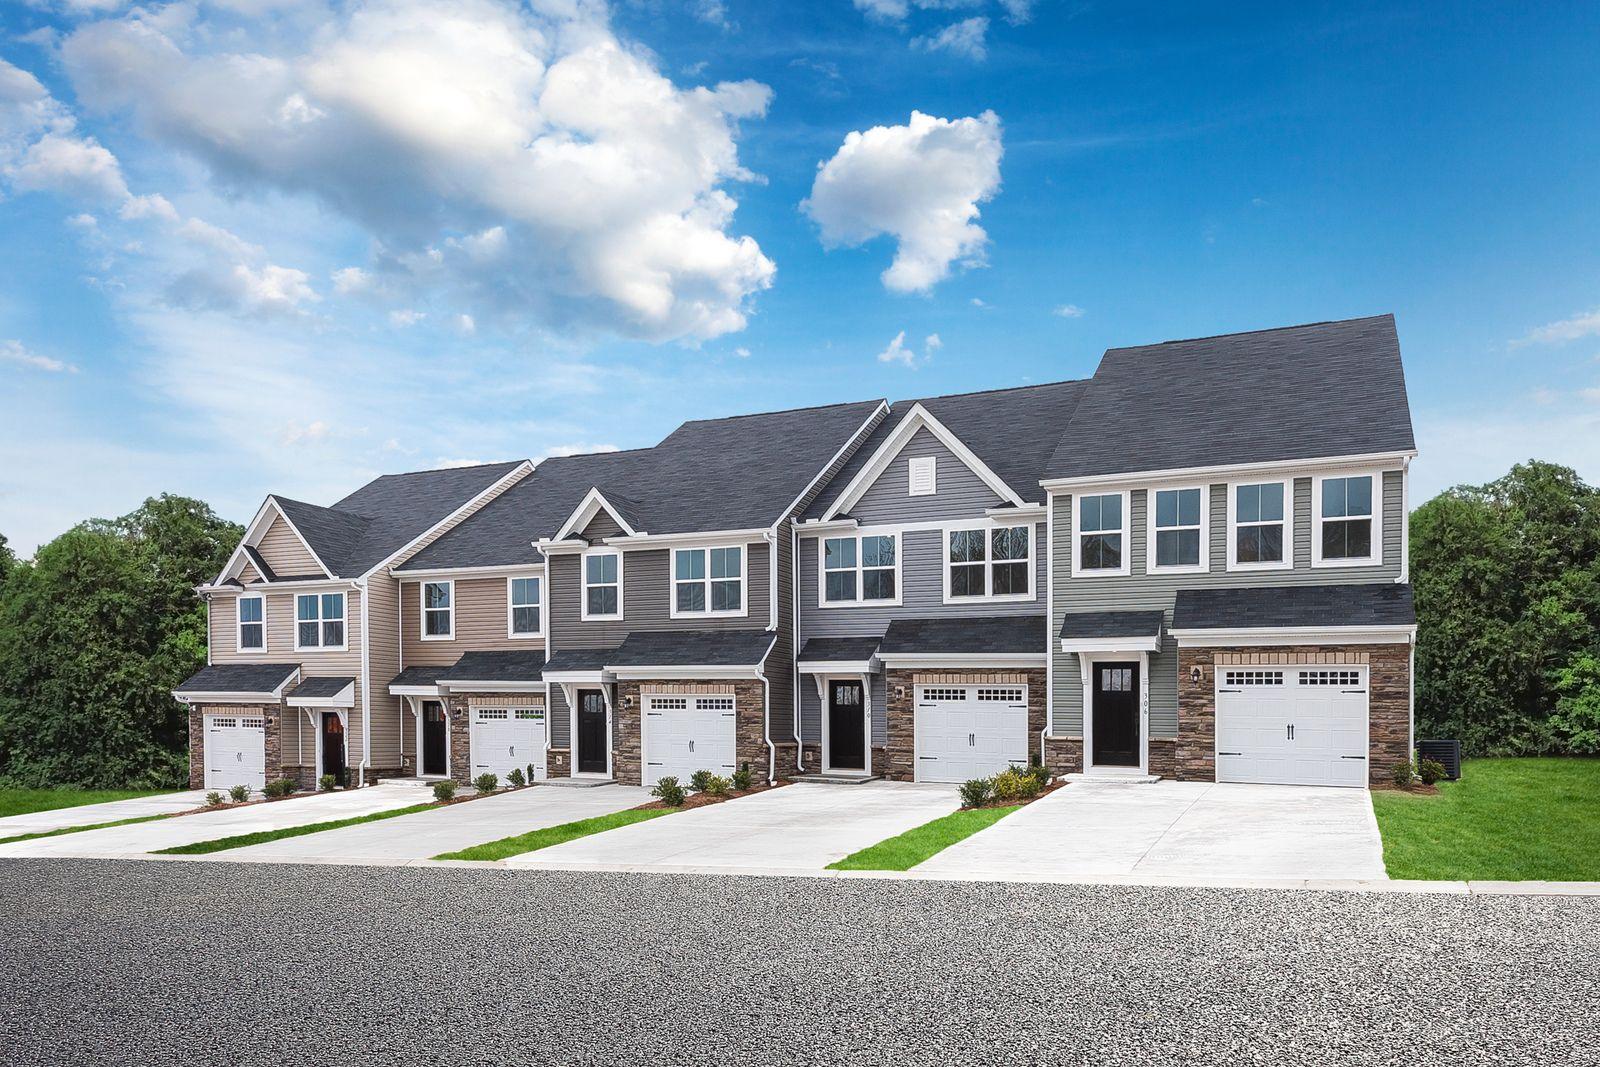 'WestStone' by Ryan Homes-GVL in Greenville-Spartanburg